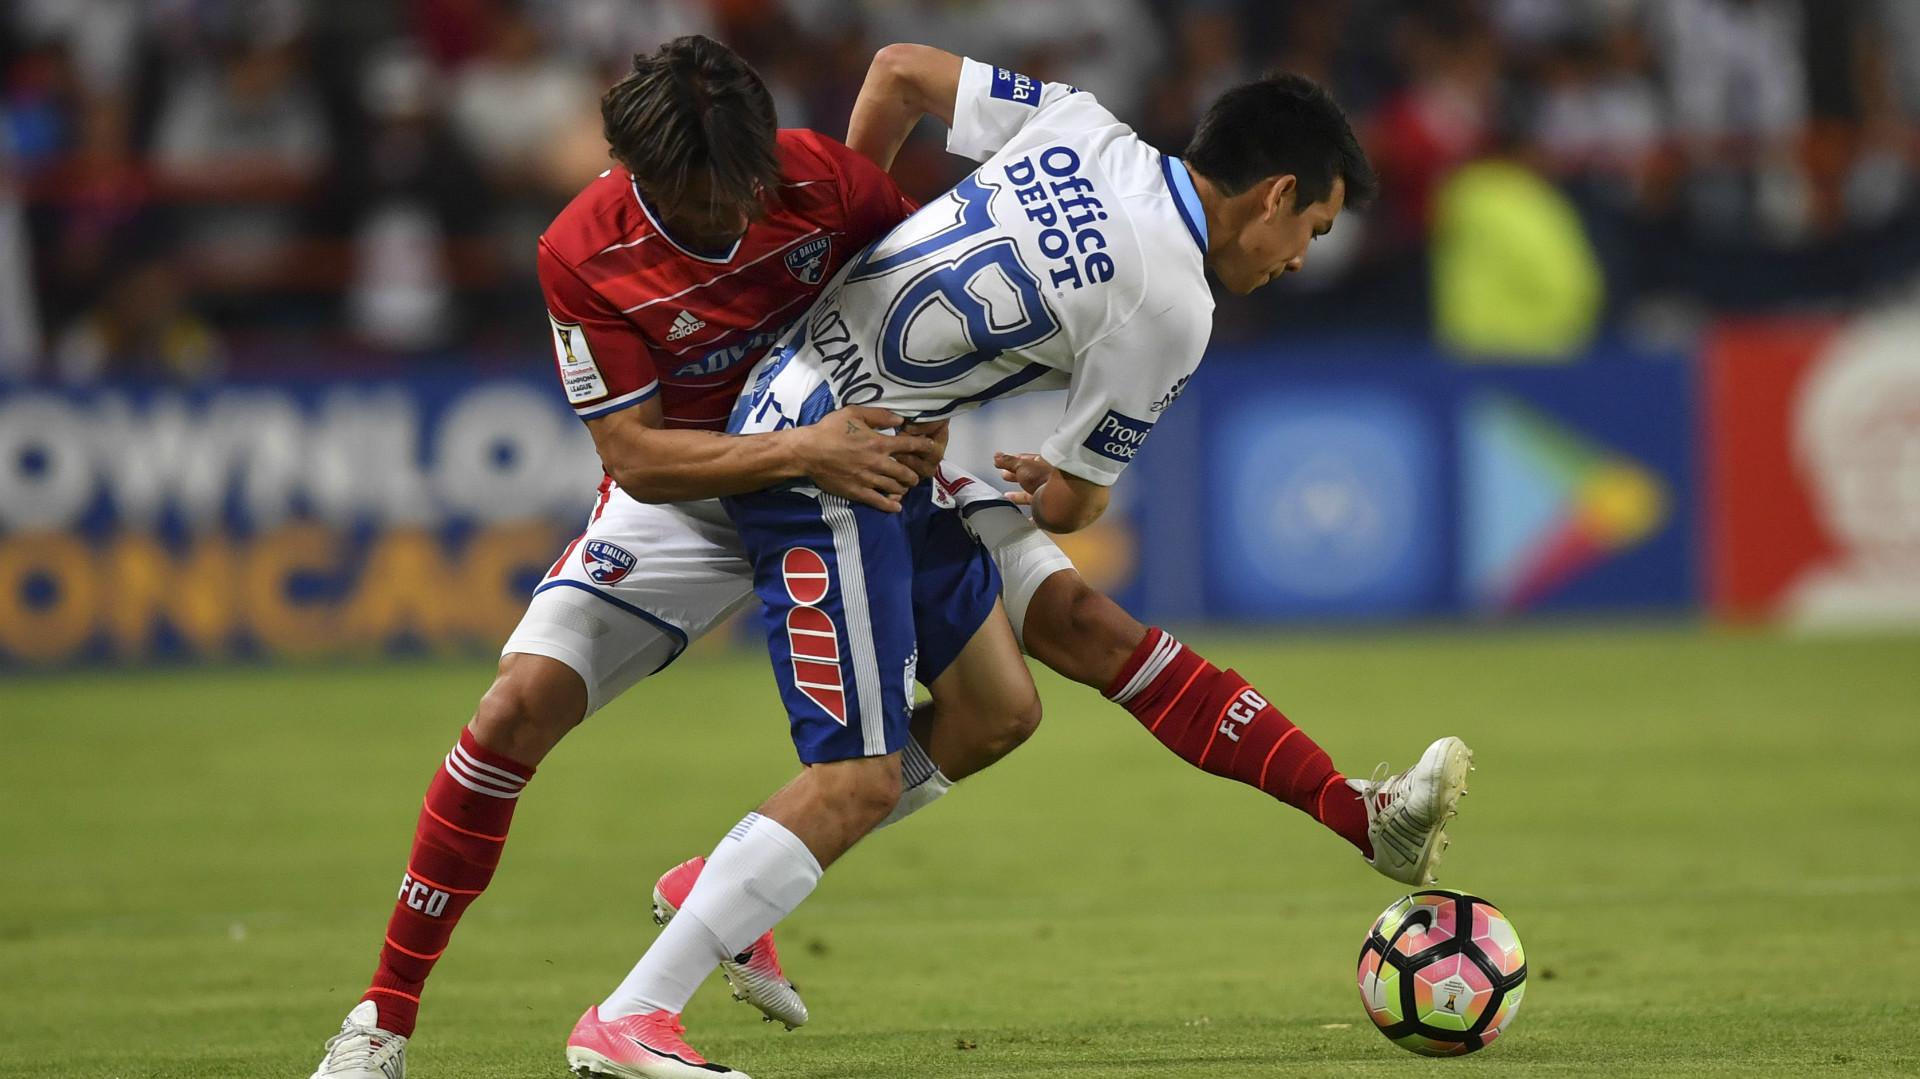 Hernan Grana FC Dallas Hirving Lozano Pachuca